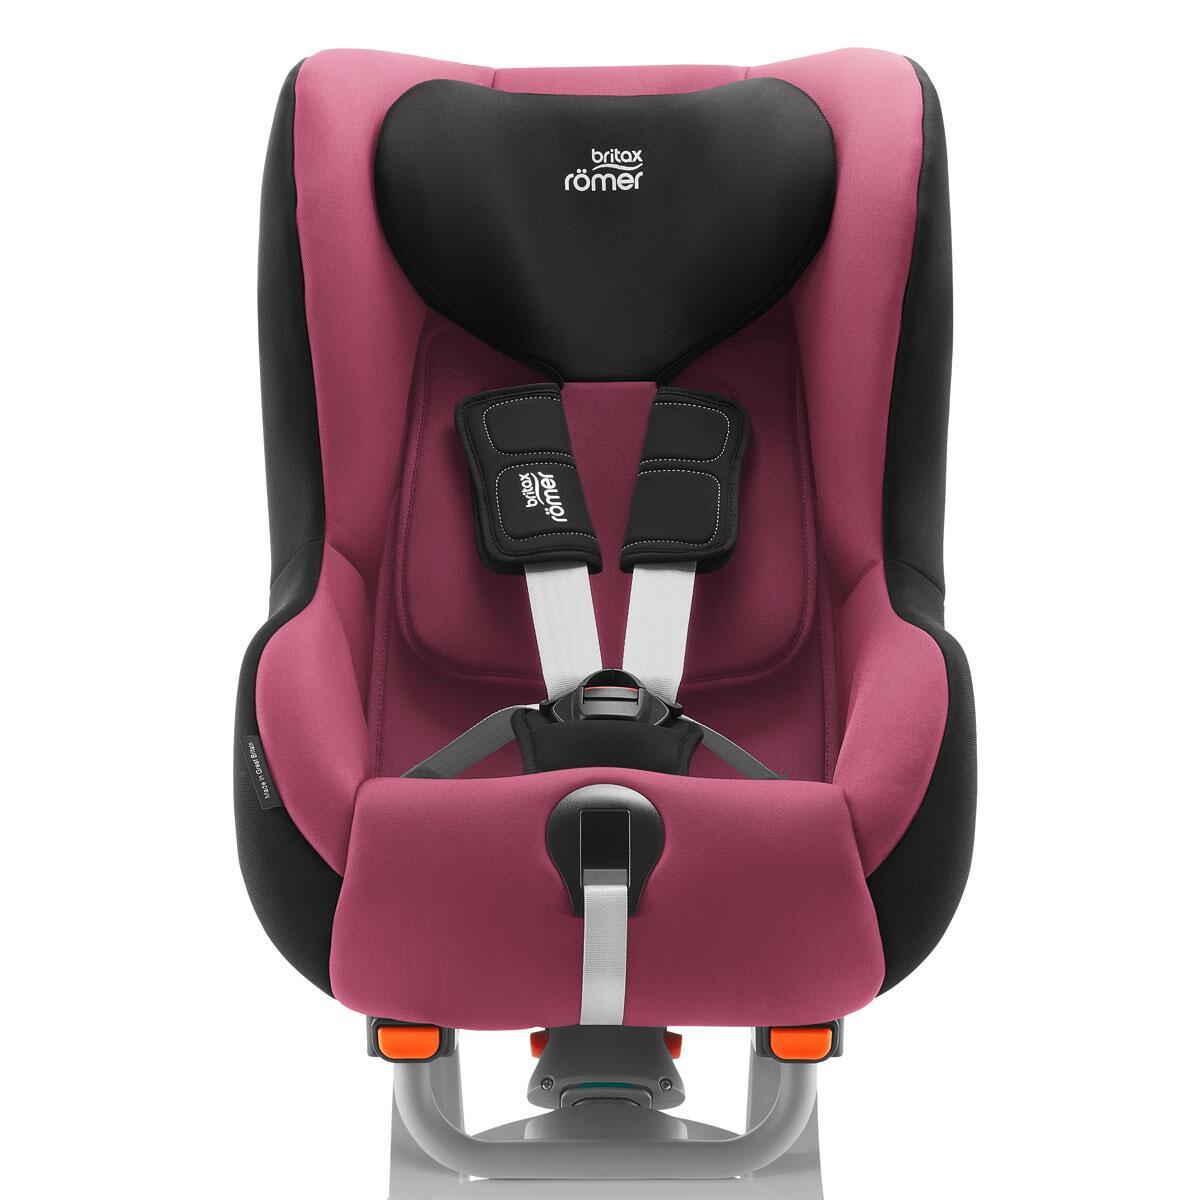 britax r mer max way plus car seat. Black Bedroom Furniture Sets. Home Design Ideas